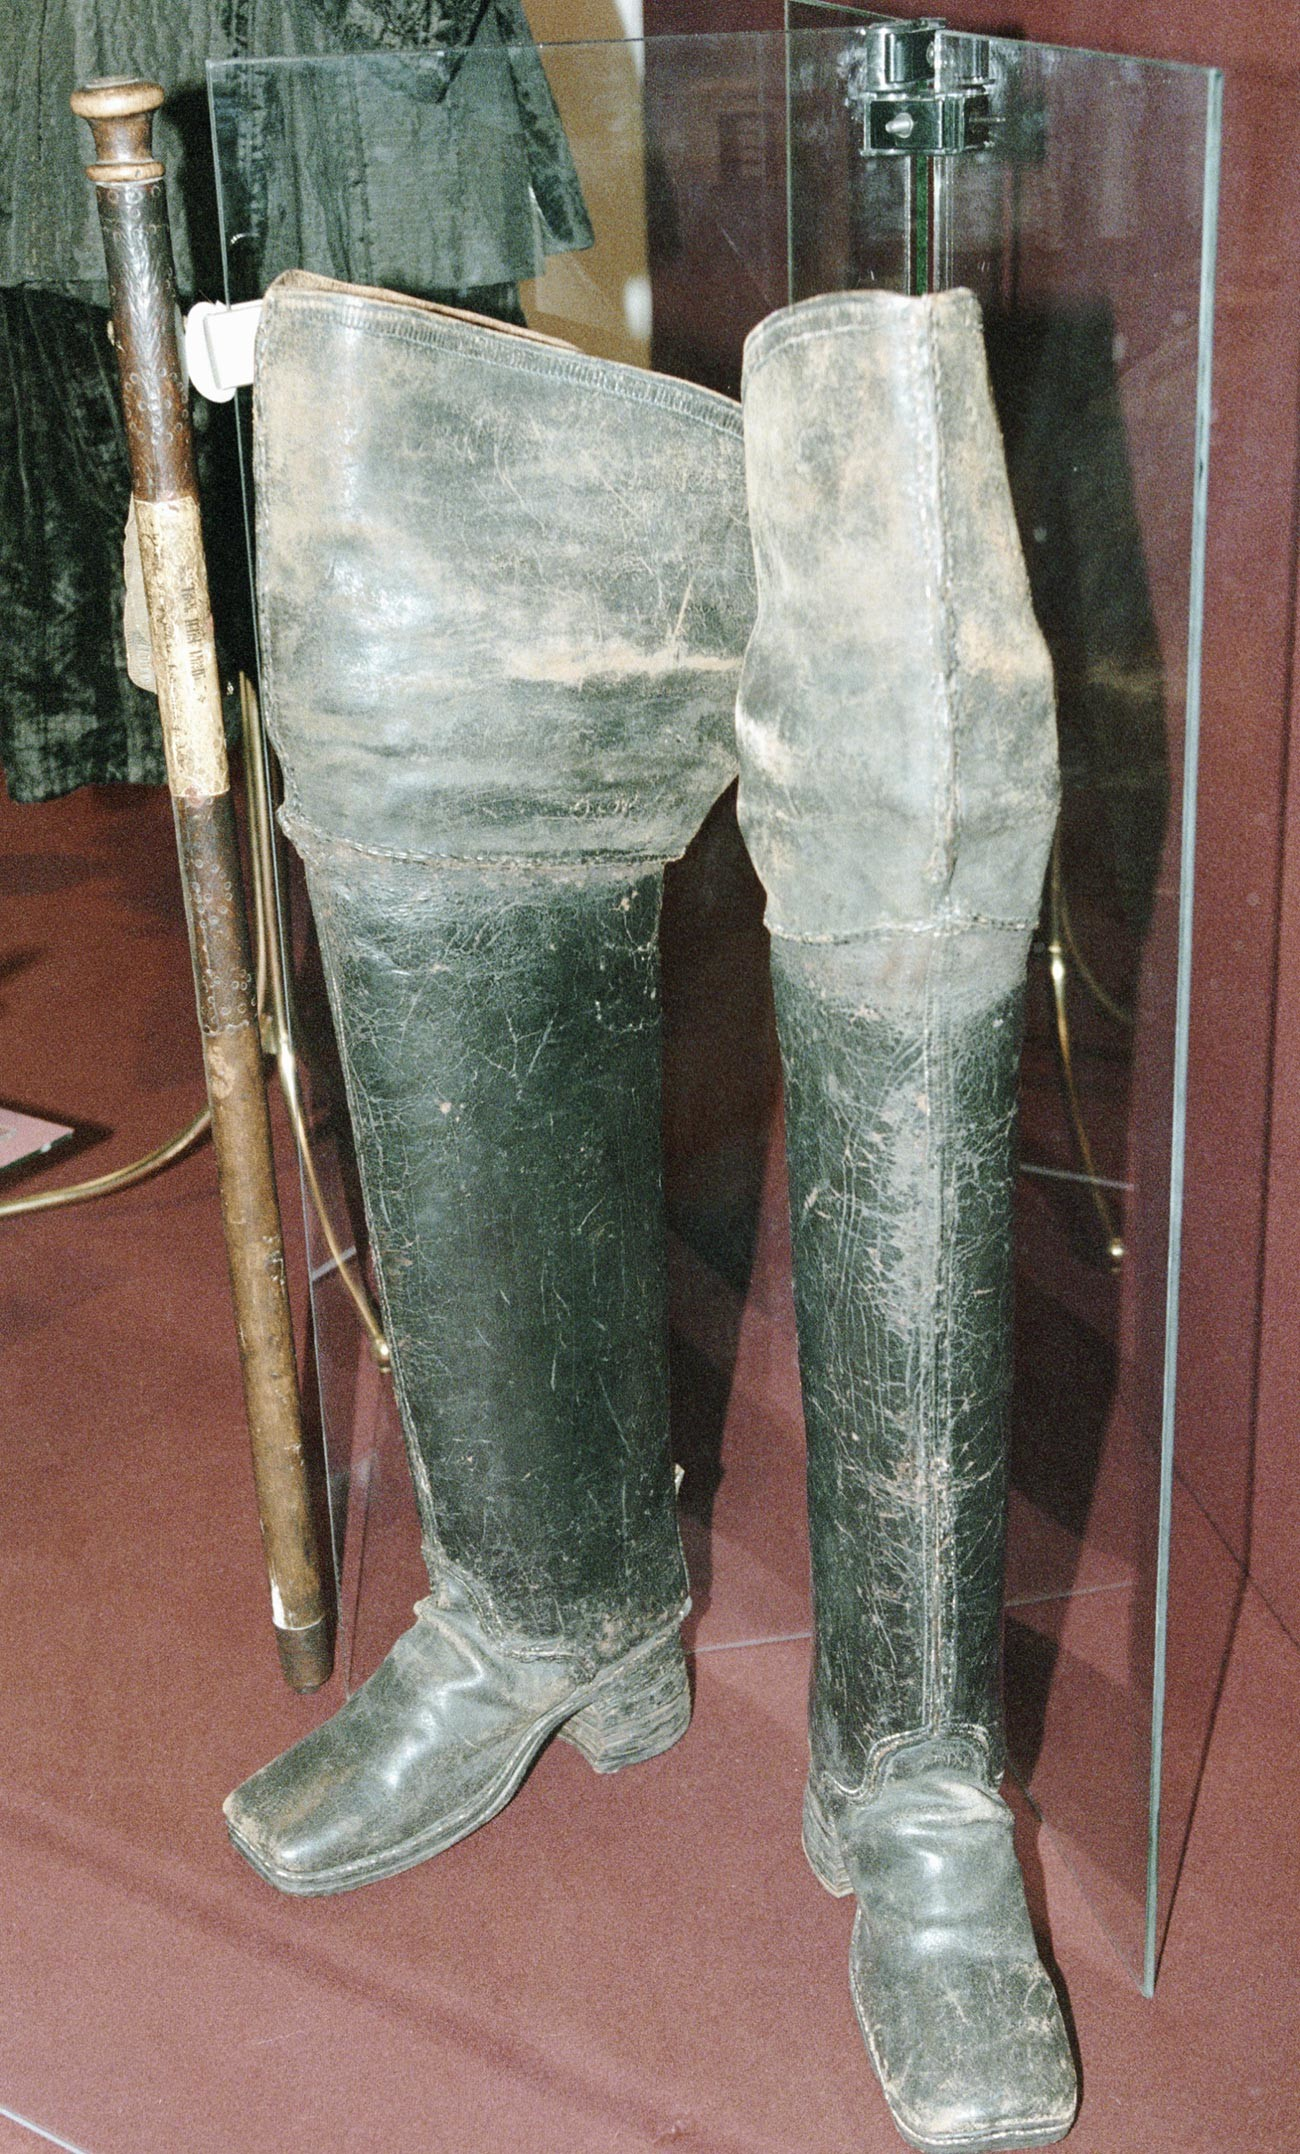 Čizme cara Petra Aleksejeviča (kraj 17. – početak 18. stoljeća).